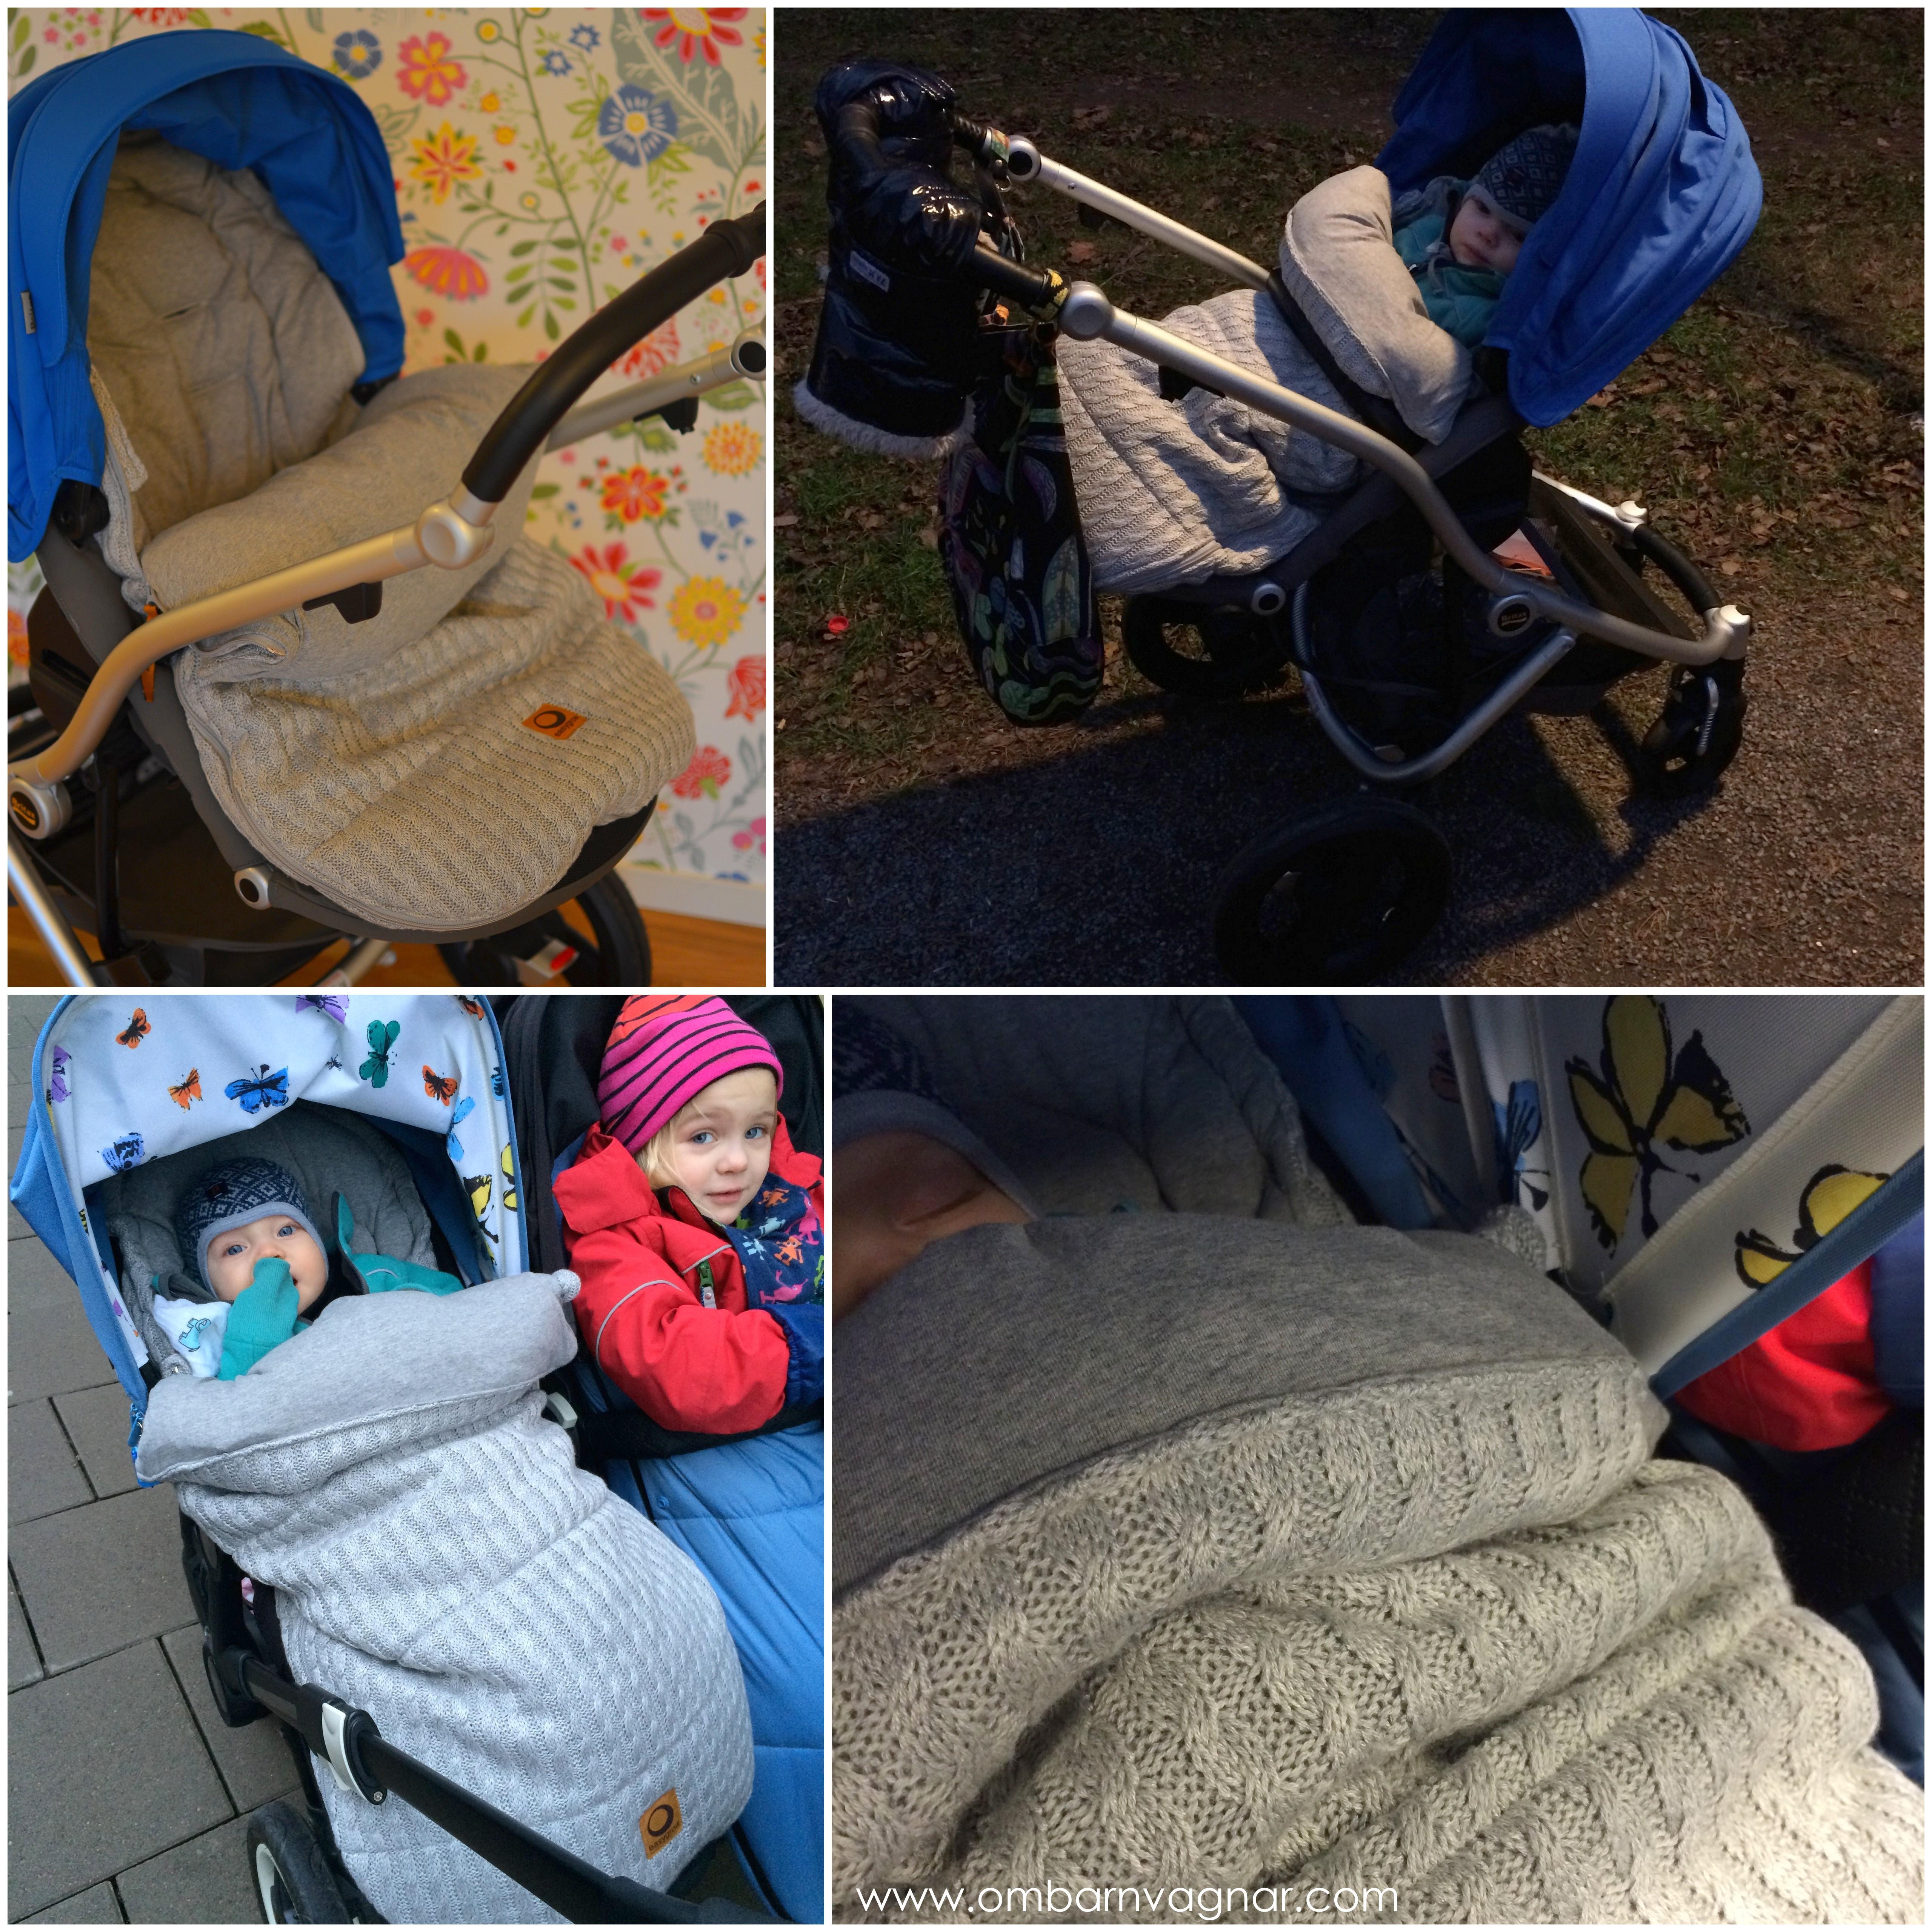 Easygrow Grandma åkpåse i barnvagnen